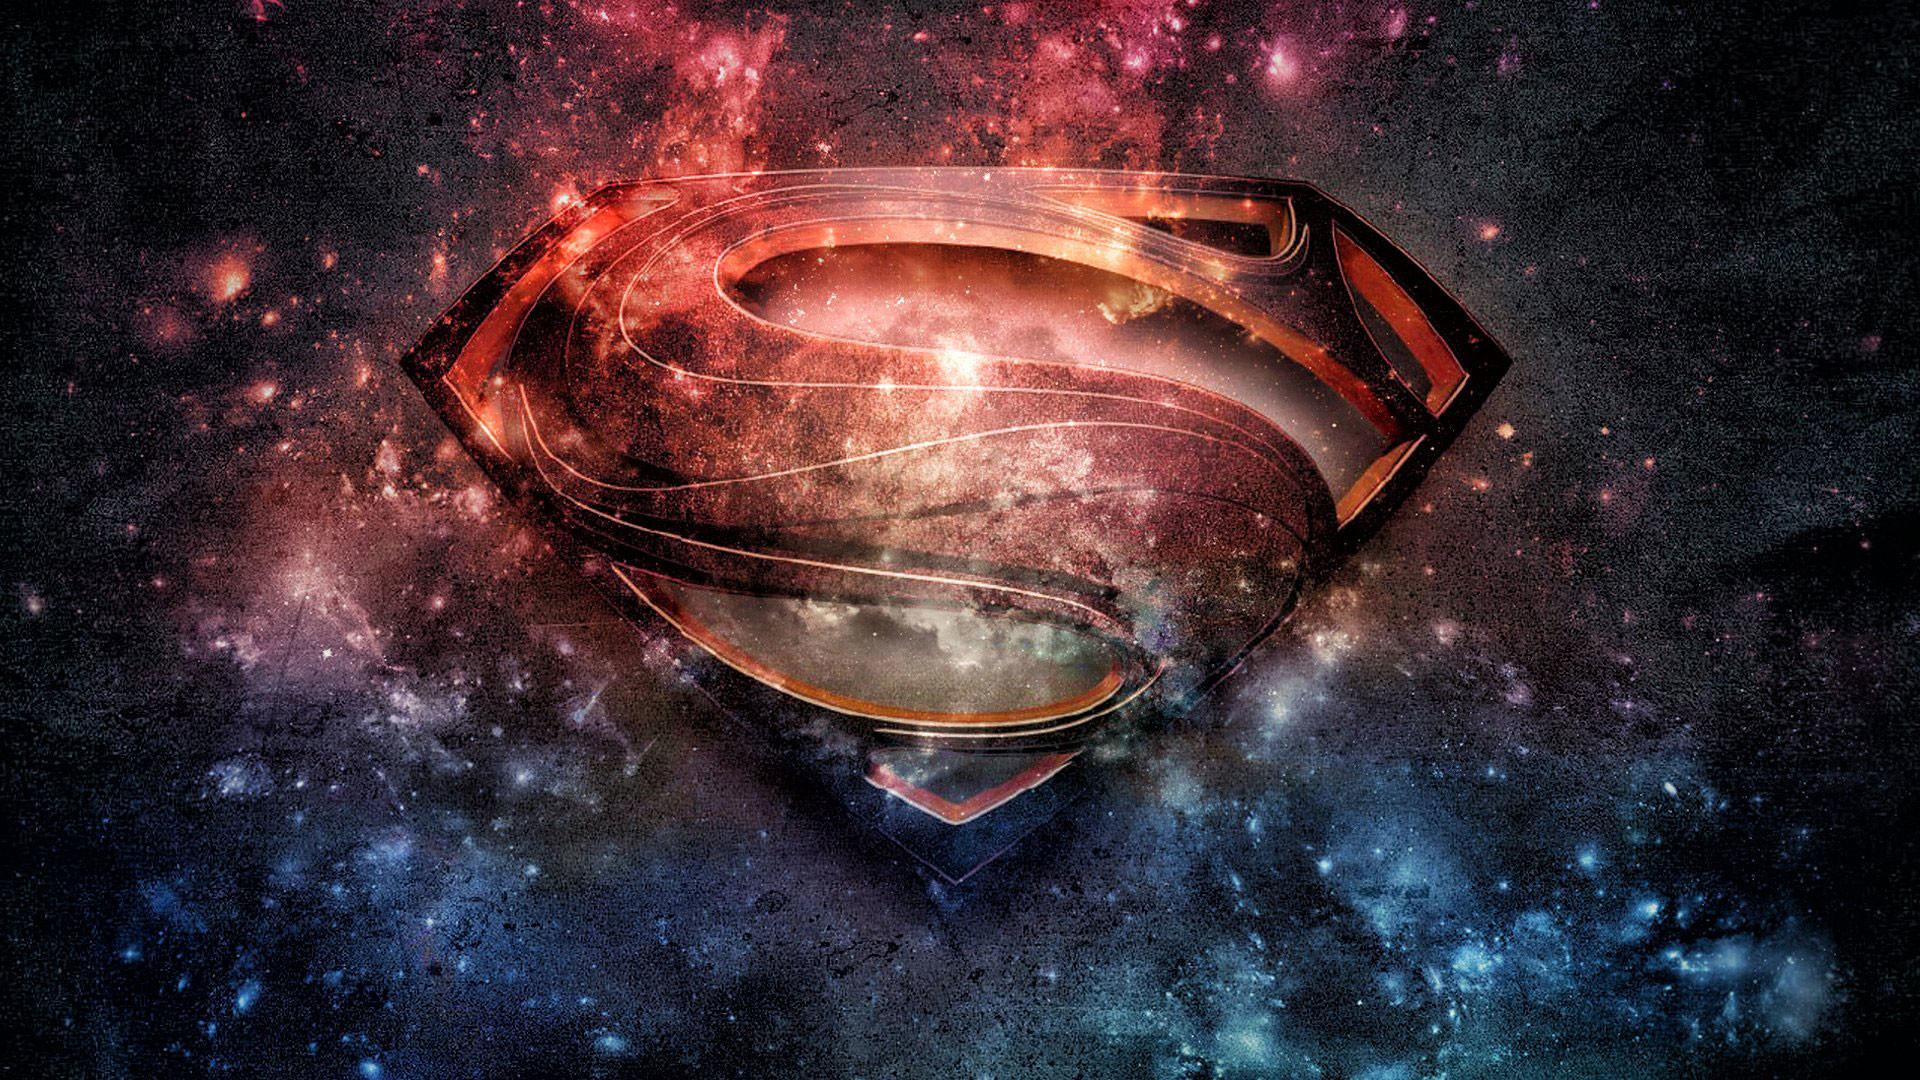 hd pics photos attractive superman logo hollywood movies beautiful hd  quality desktop background wallpaper